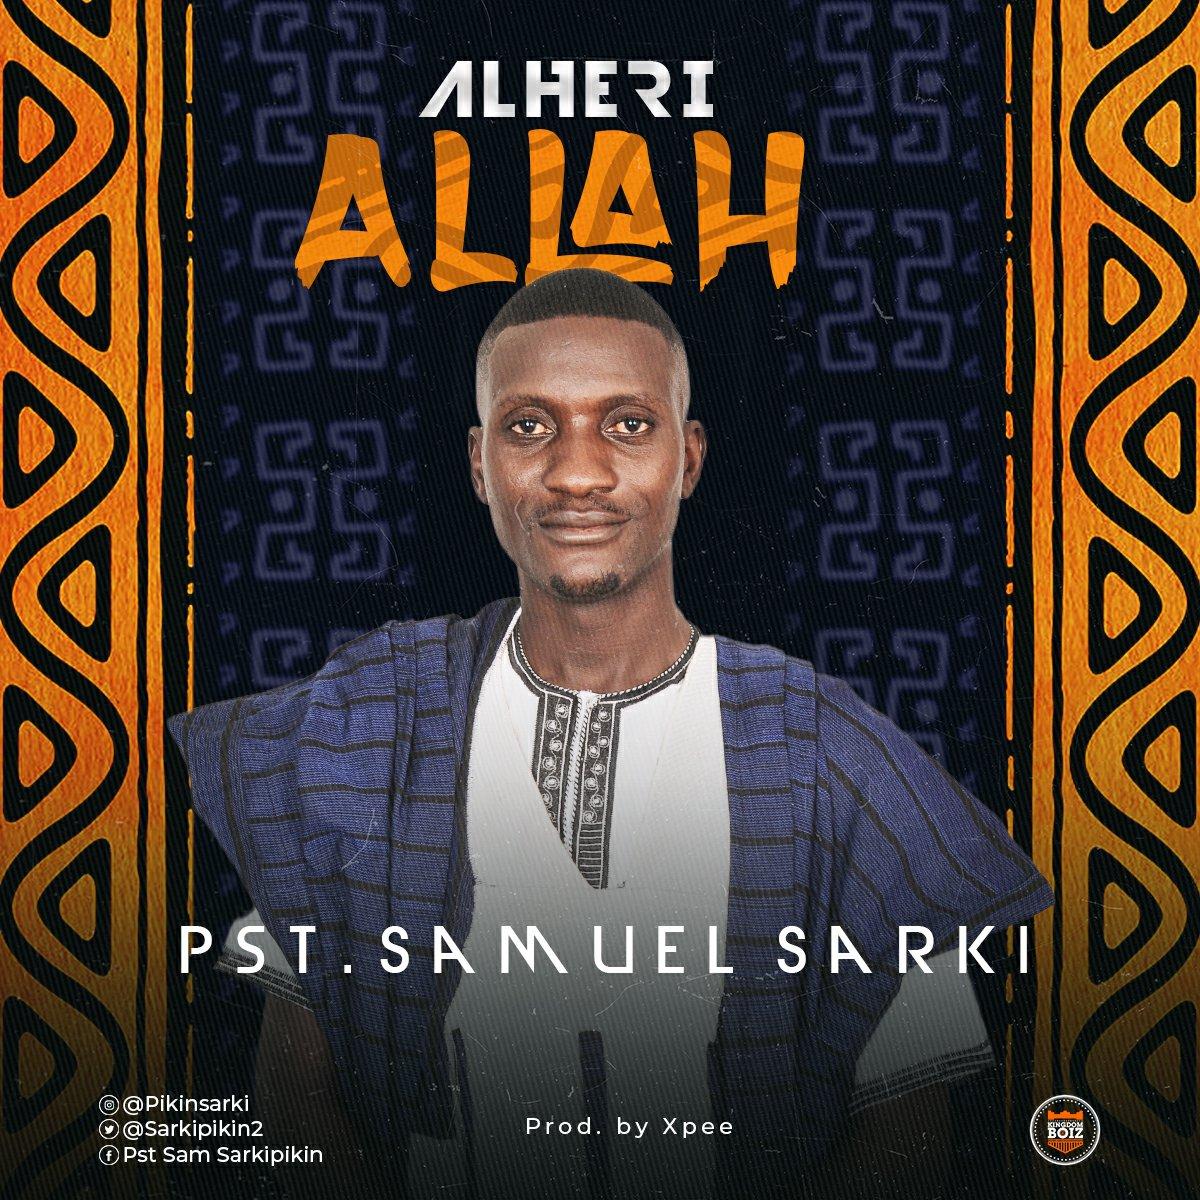 Pst. Samuel Sarki - Alheri Allah Mp3 Download